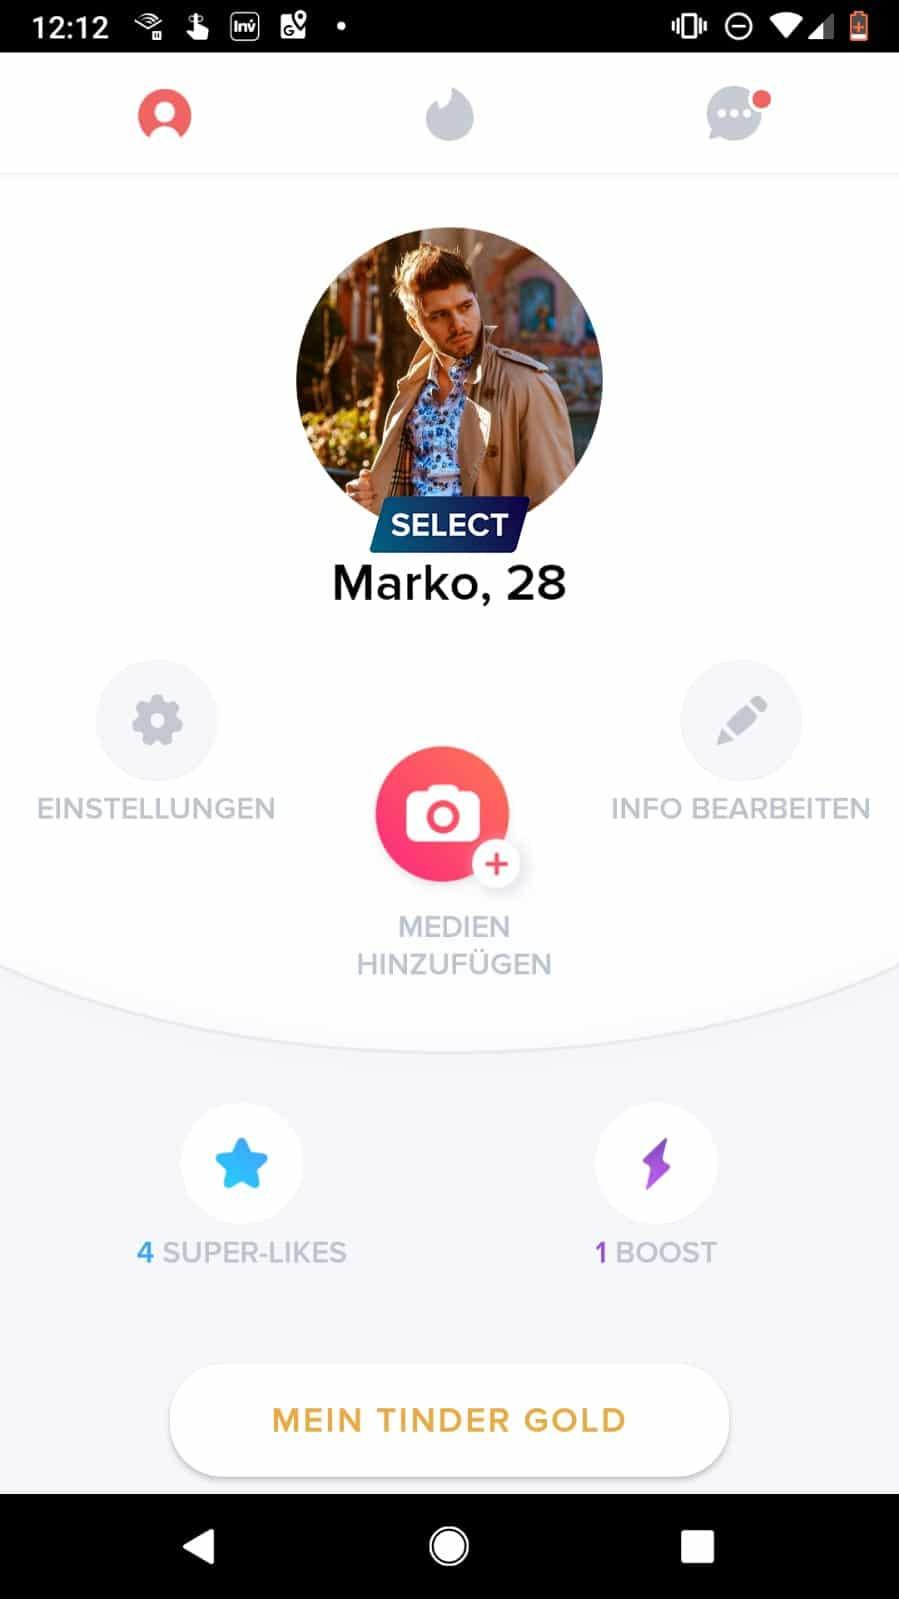 Flirtcoach-Marko-Polo-Tinder-Profi-und-Experte